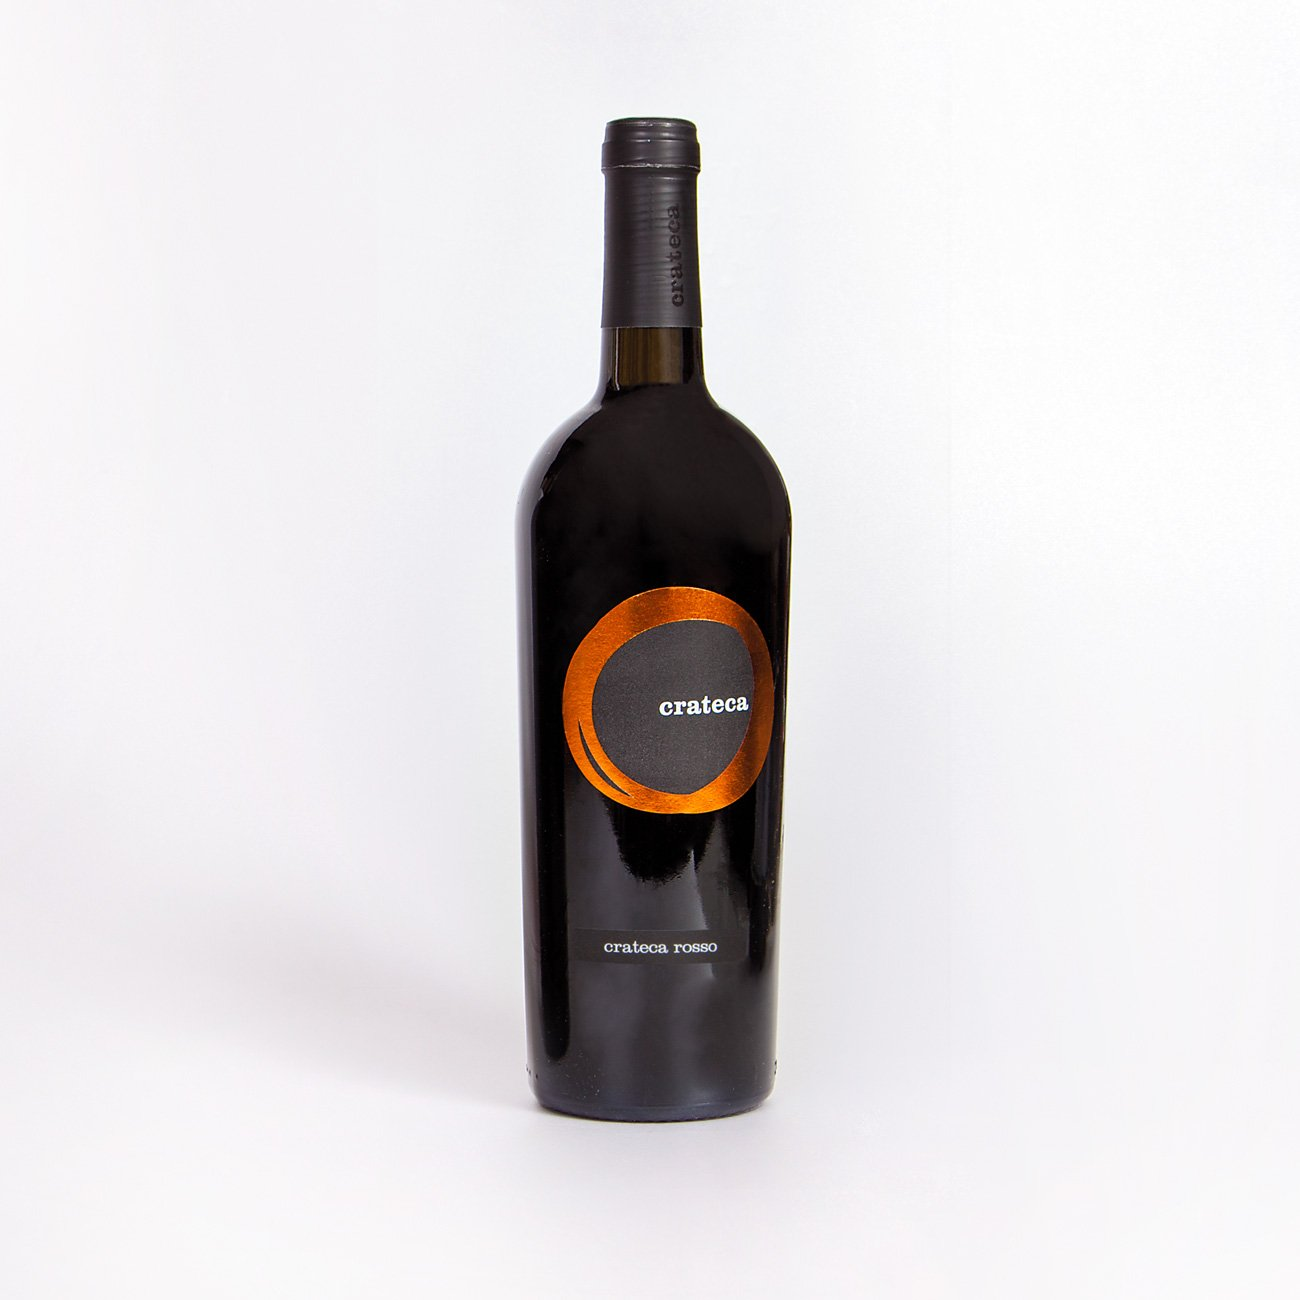 bottiglia crateca rosso, vini ischia